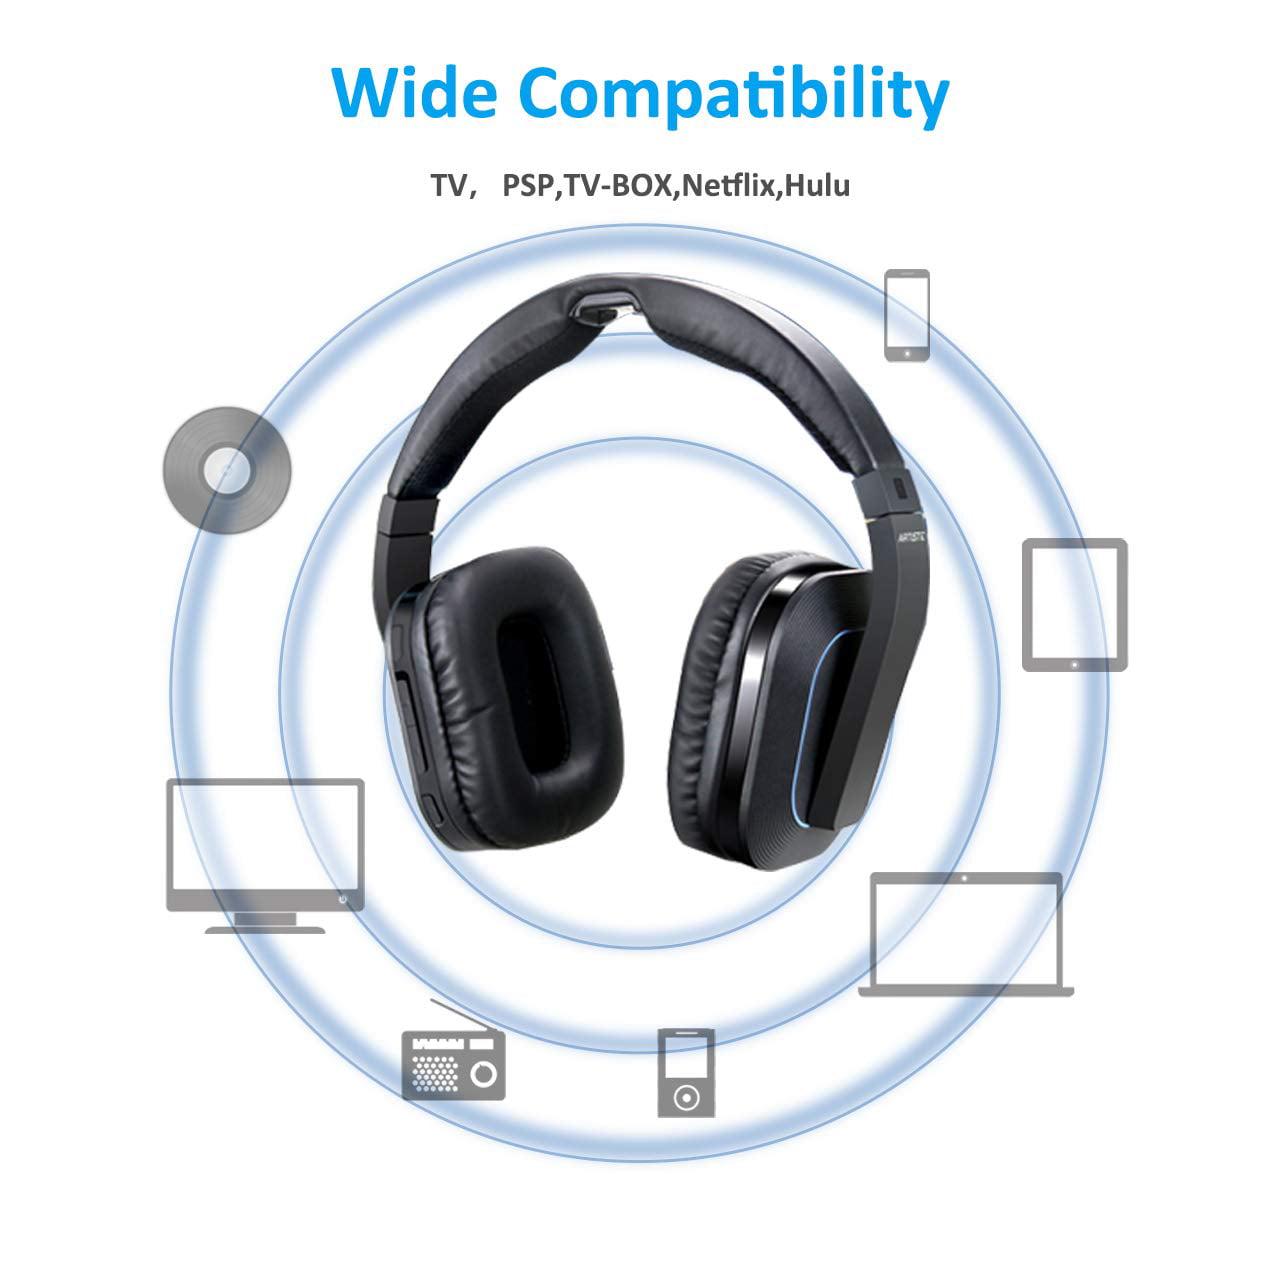 edada2714b0 Wireless Stereo TV Headphones, Artiste D1 2.4GHz Optical Fiber TV Headset  for TV Listening W/Digital Output,20 Hour Battery and Headphones Charging  Dock ...